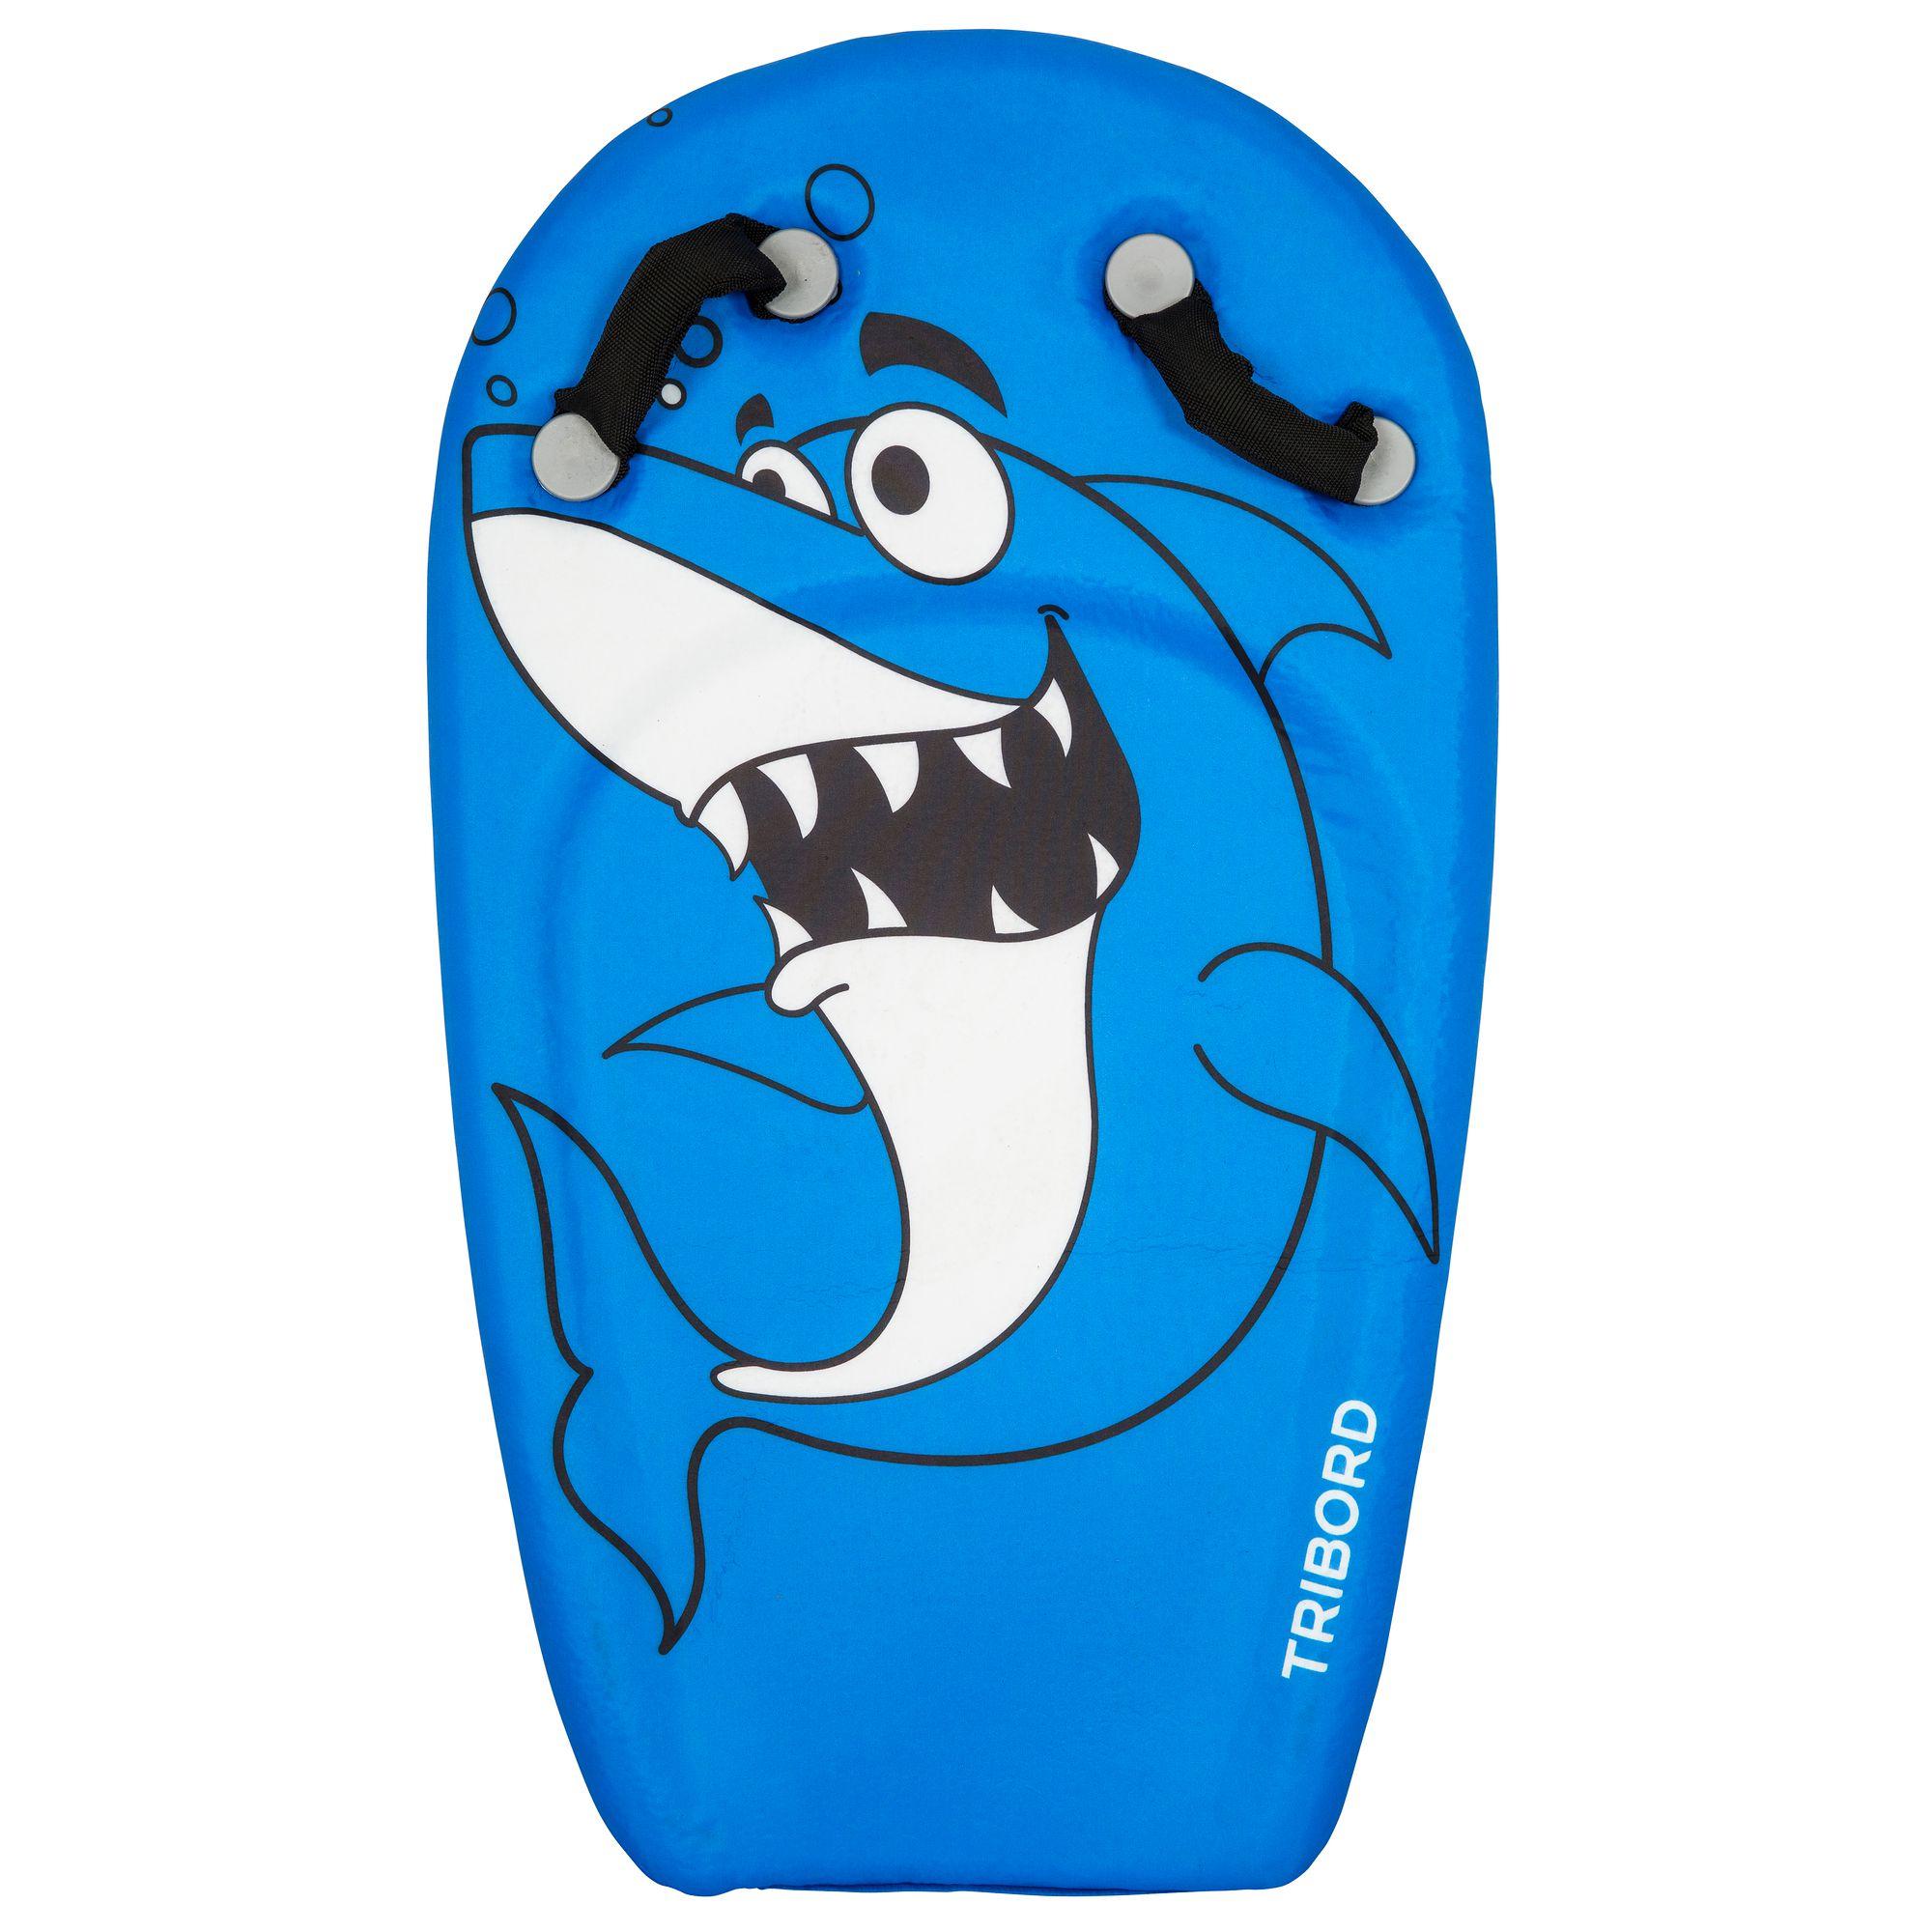 Bodyboard BODYATU enfant 4-8 ans requin bleu poignées